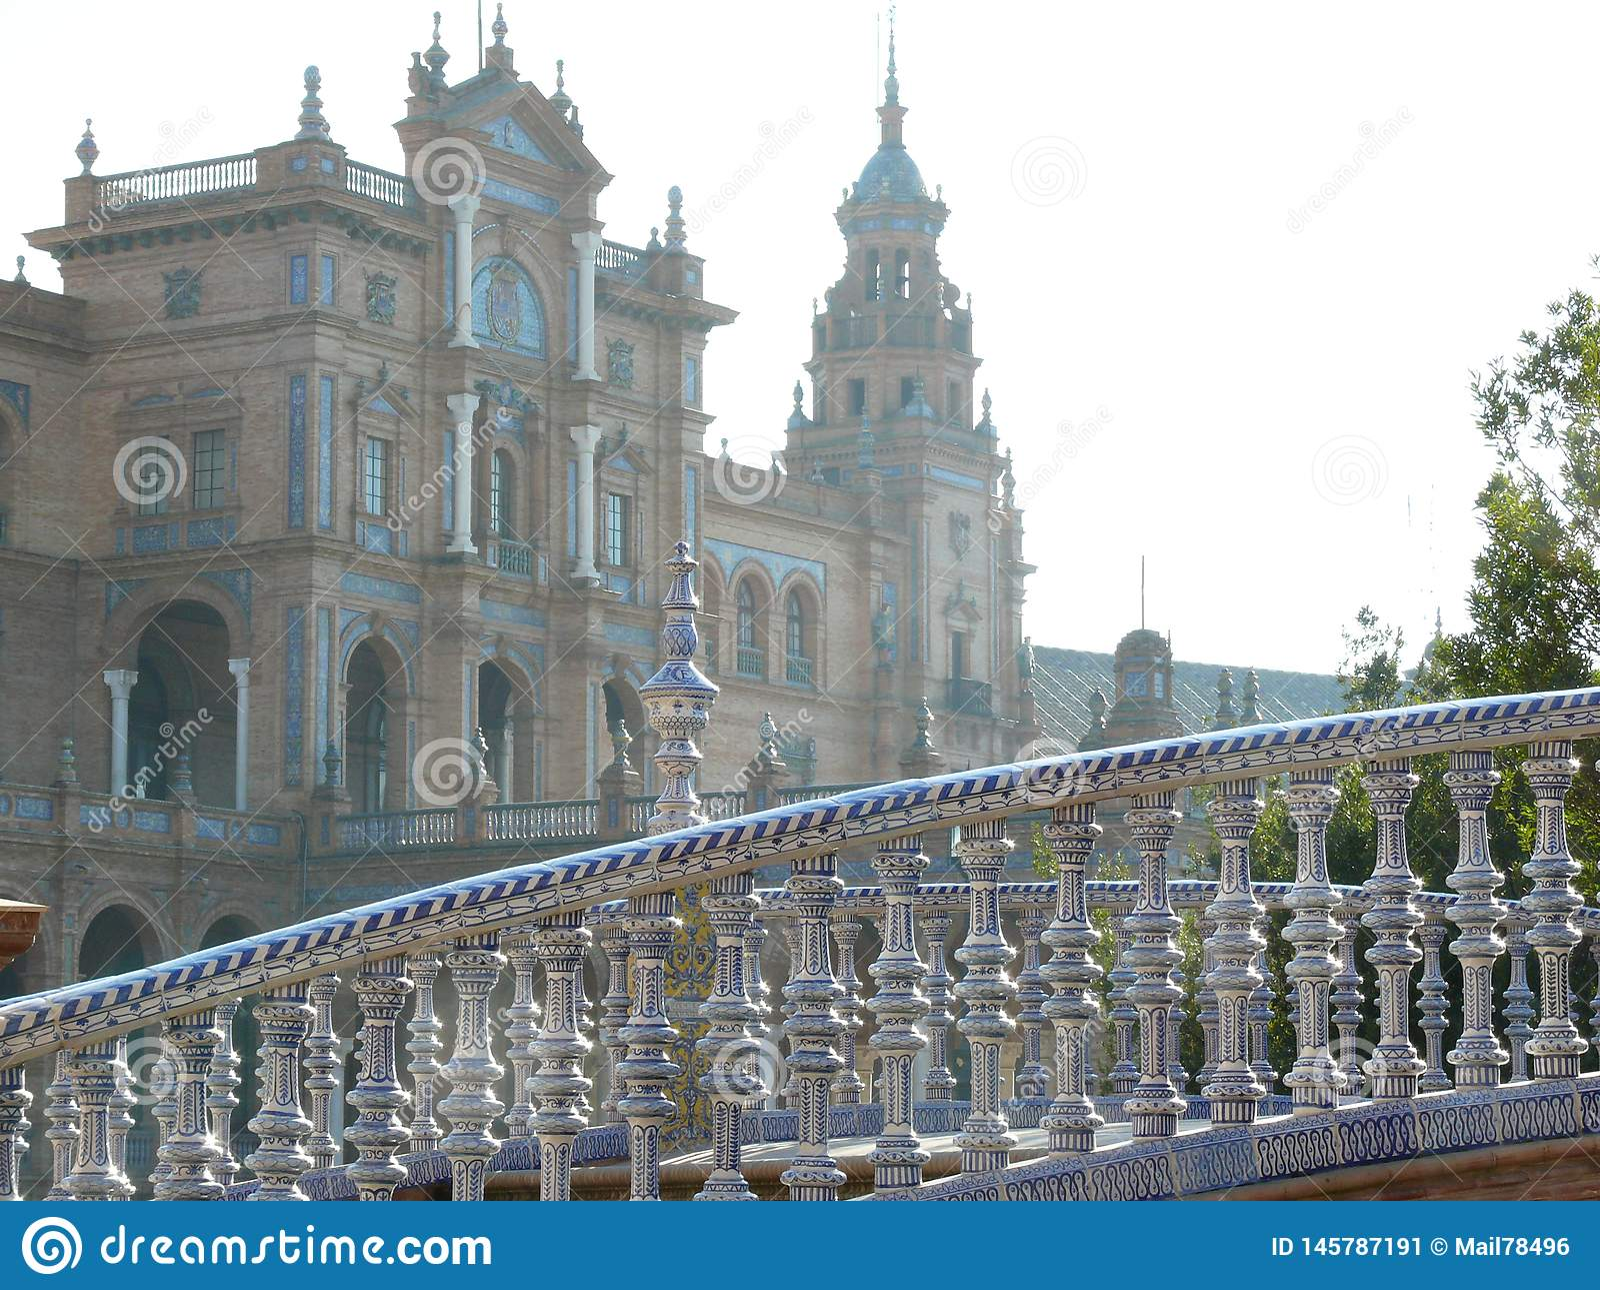 Sevillla, Spain, 01/02/2007. Royal Palace Square. Bridge